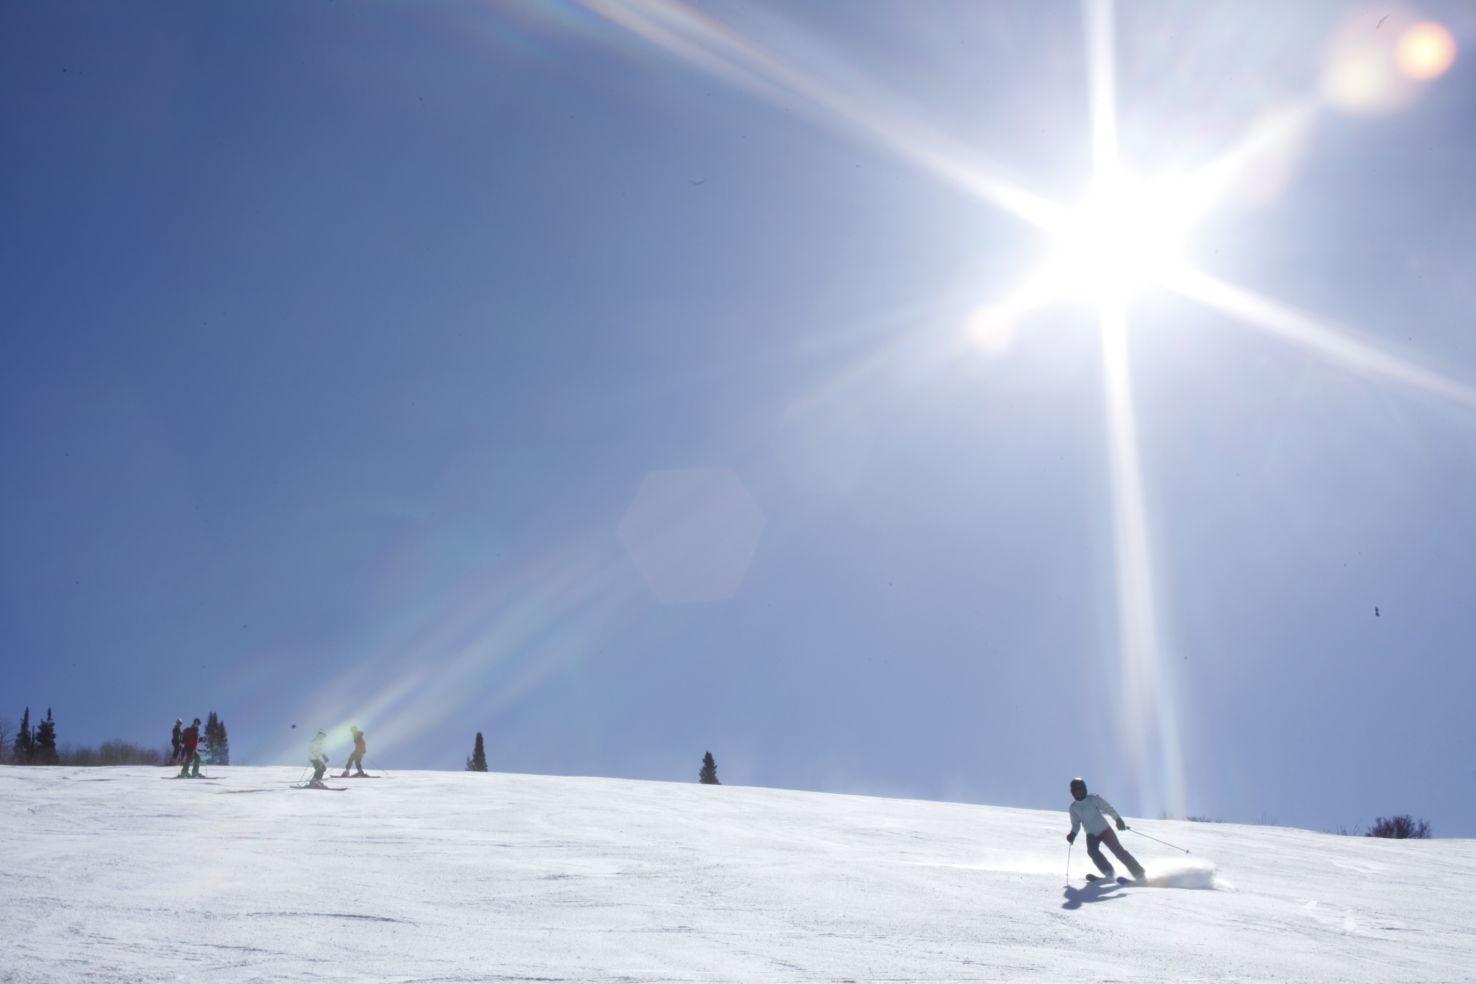 FamilySkiing_Utah_Park-City_skier